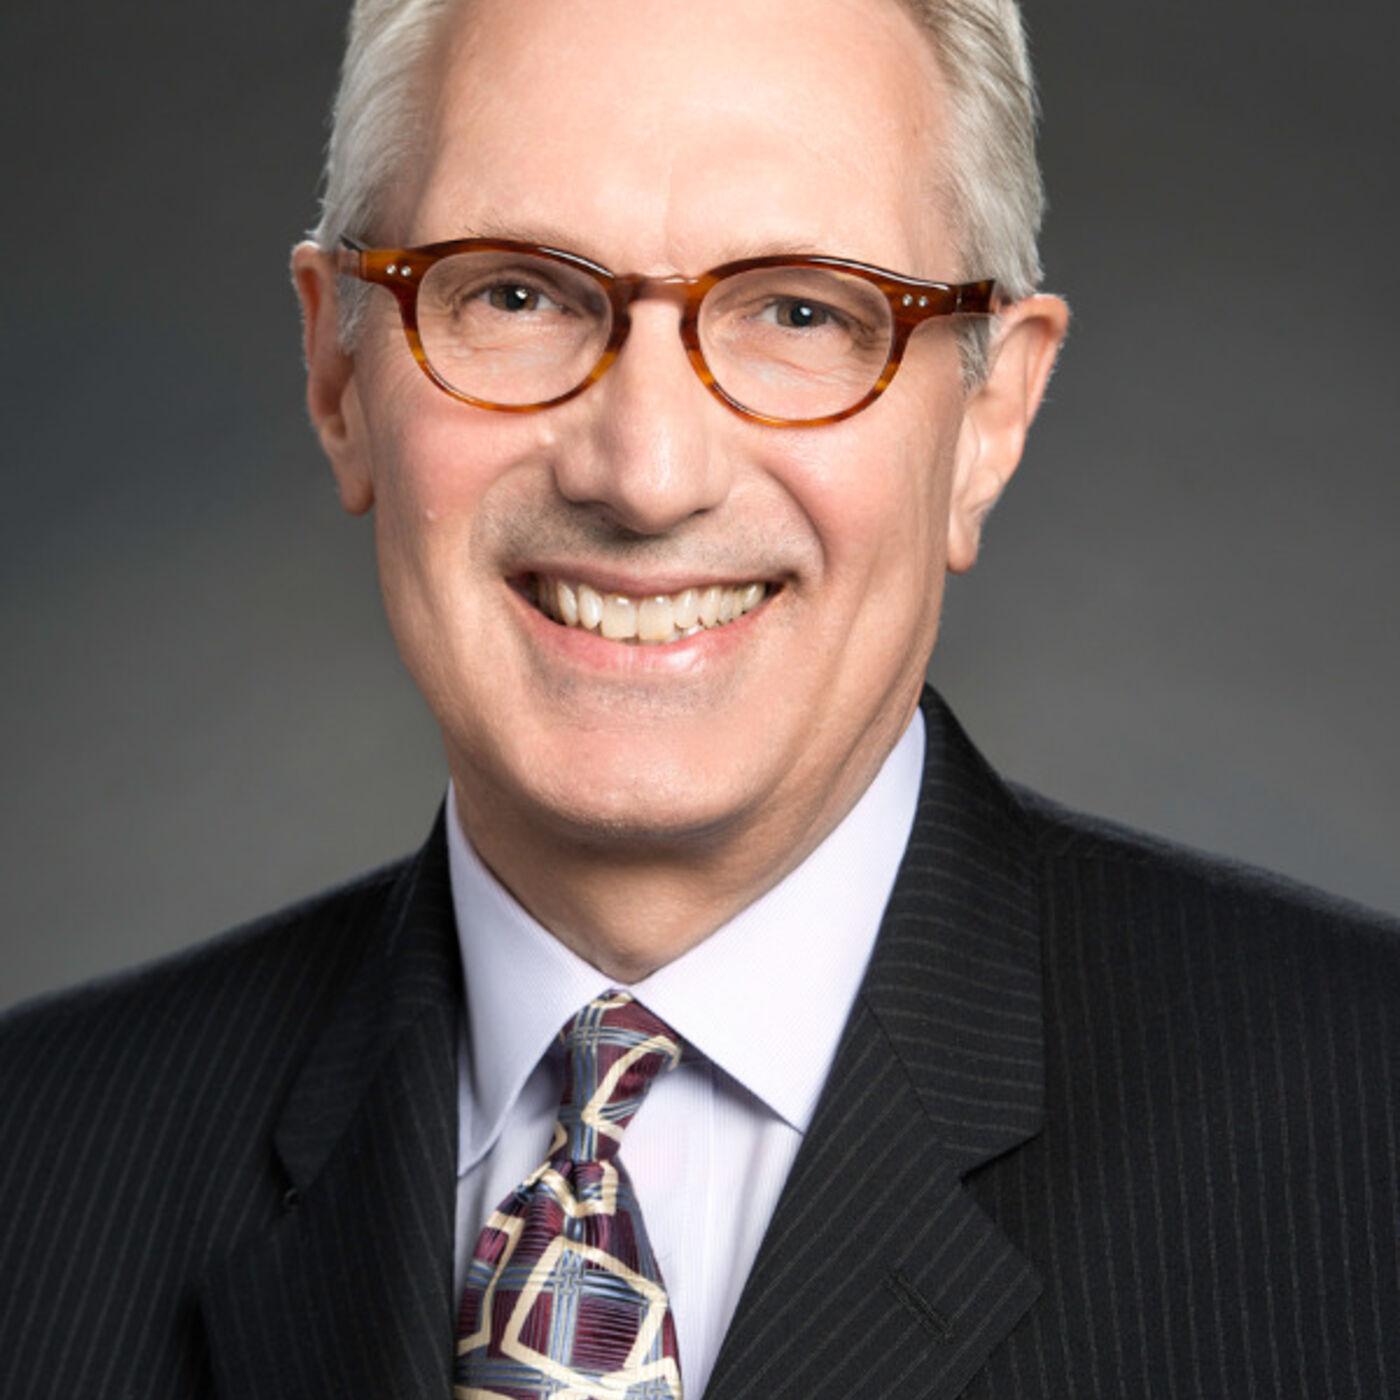 Chuck Stokes of Memorial Hermann Health System